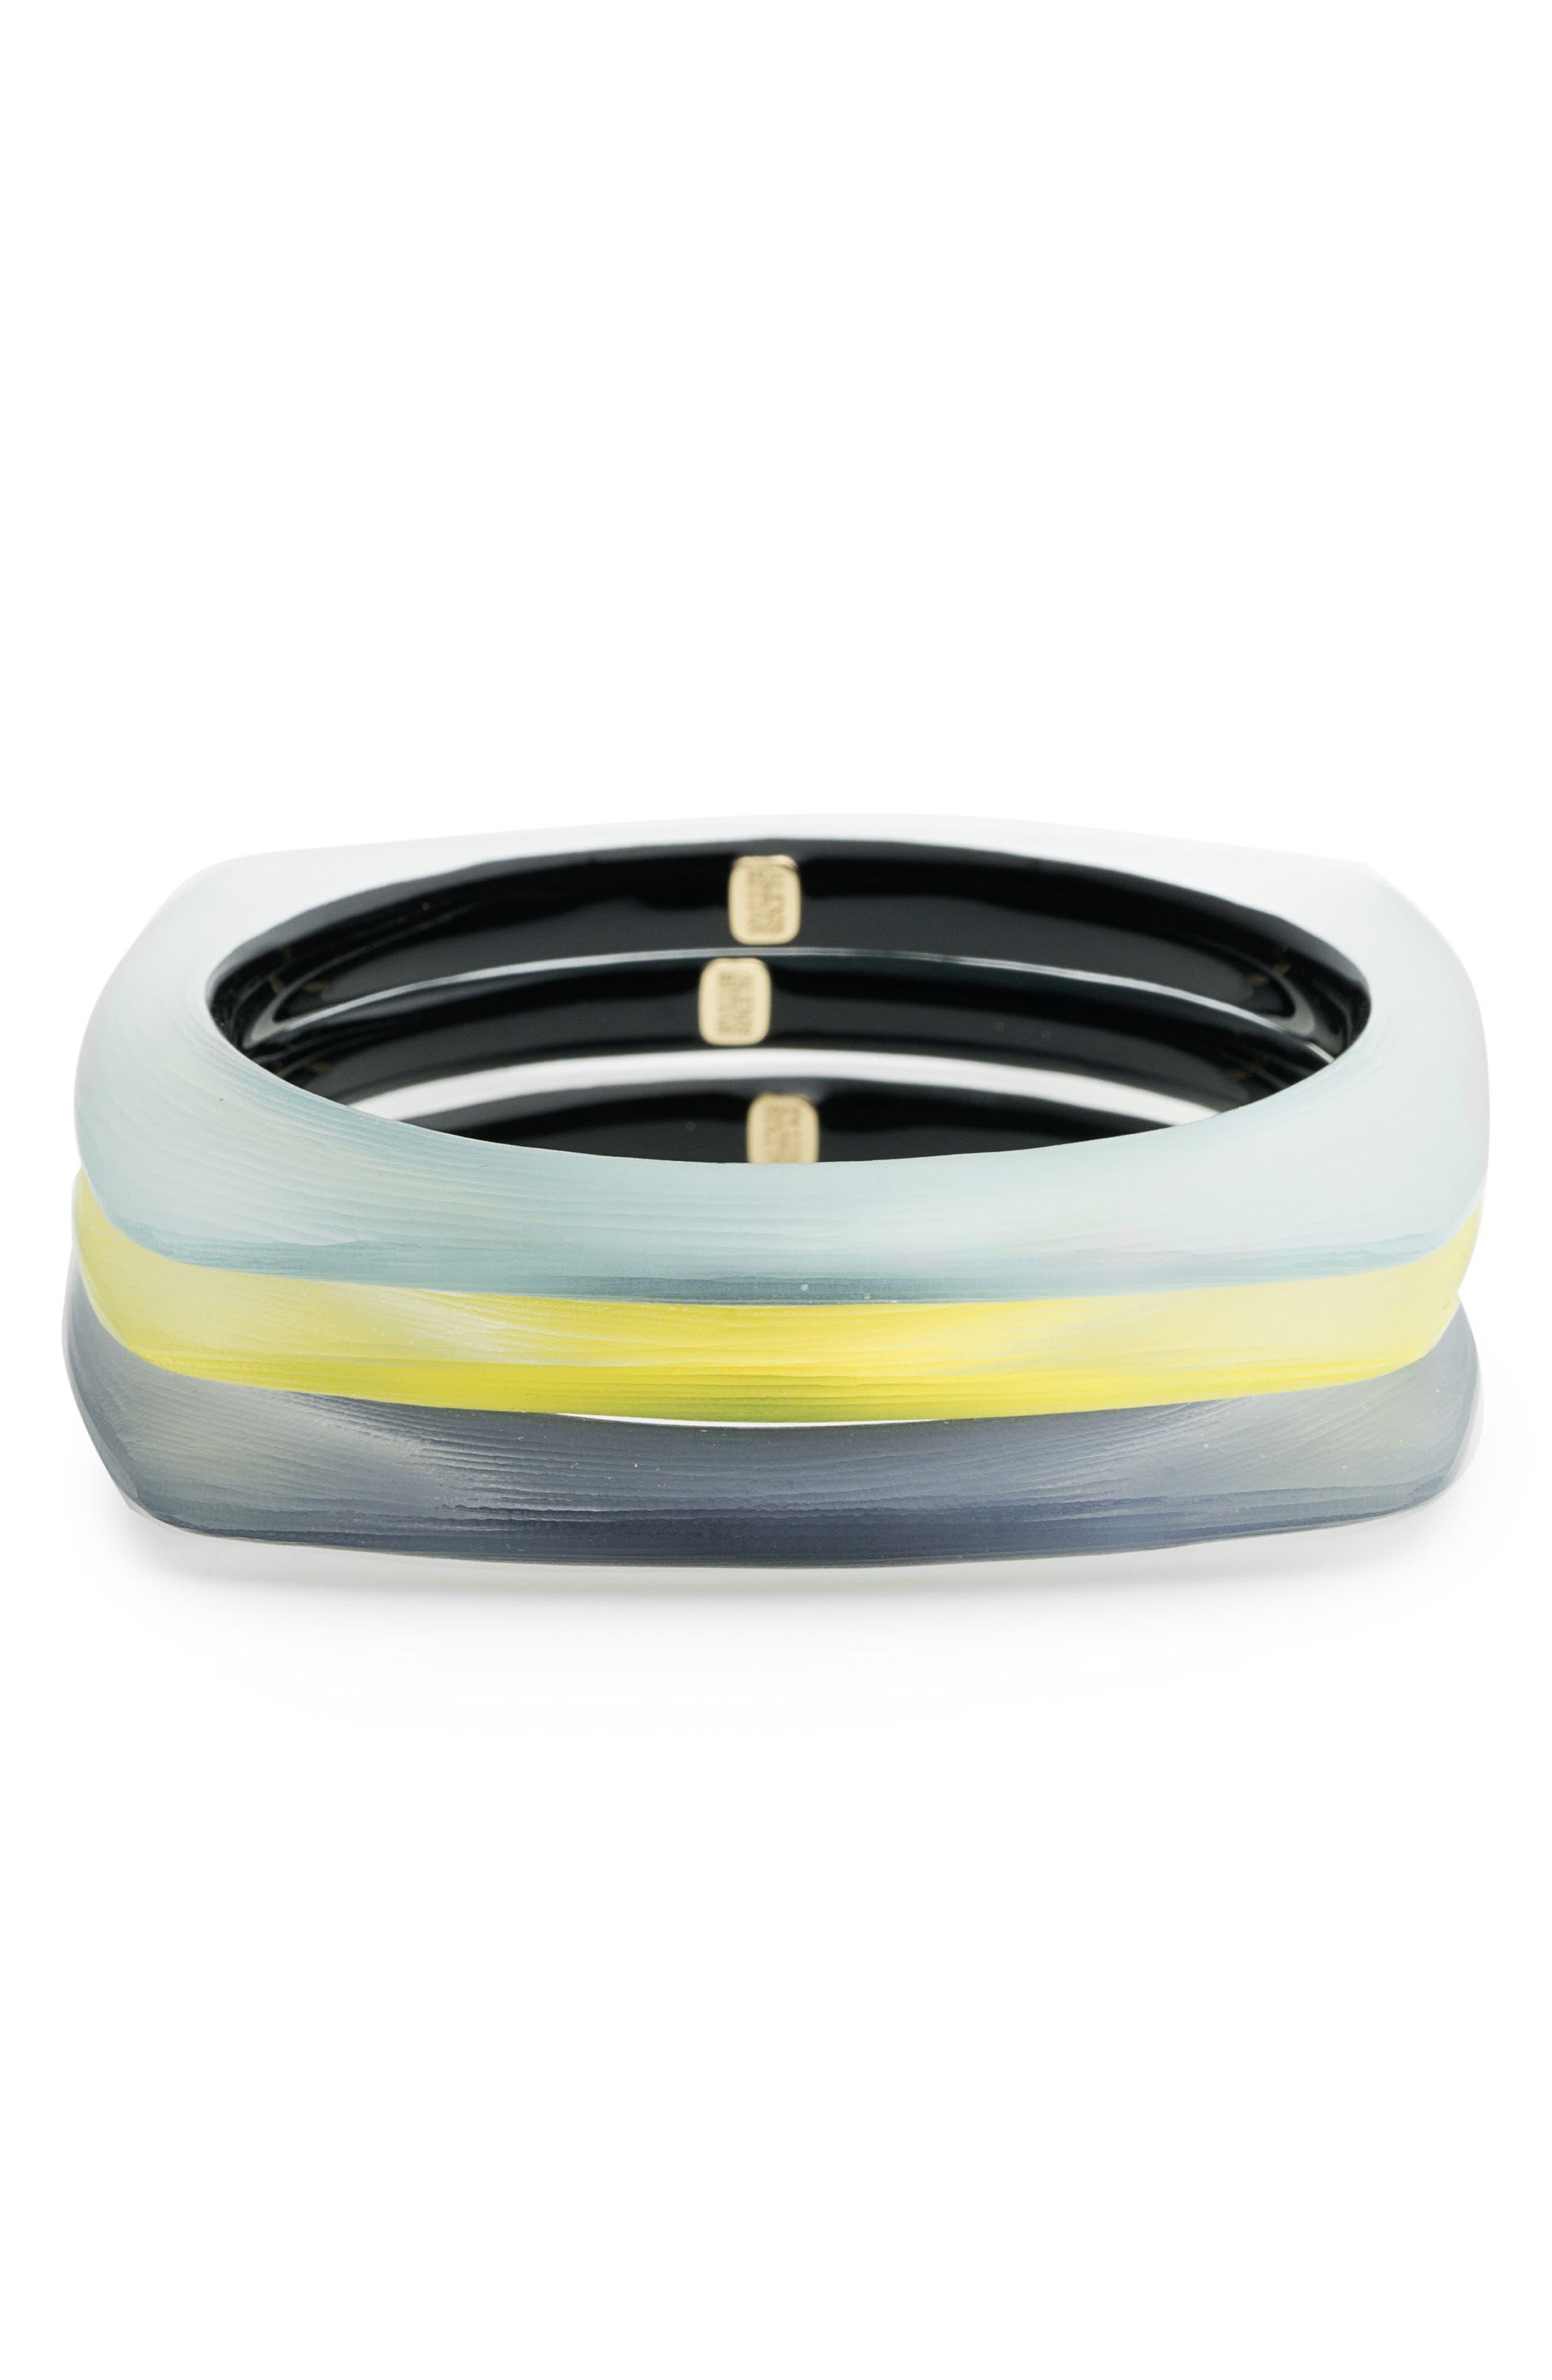 Main Image - Alexis Bittar Set of 3 Square Lucite® Bangle Bracelets